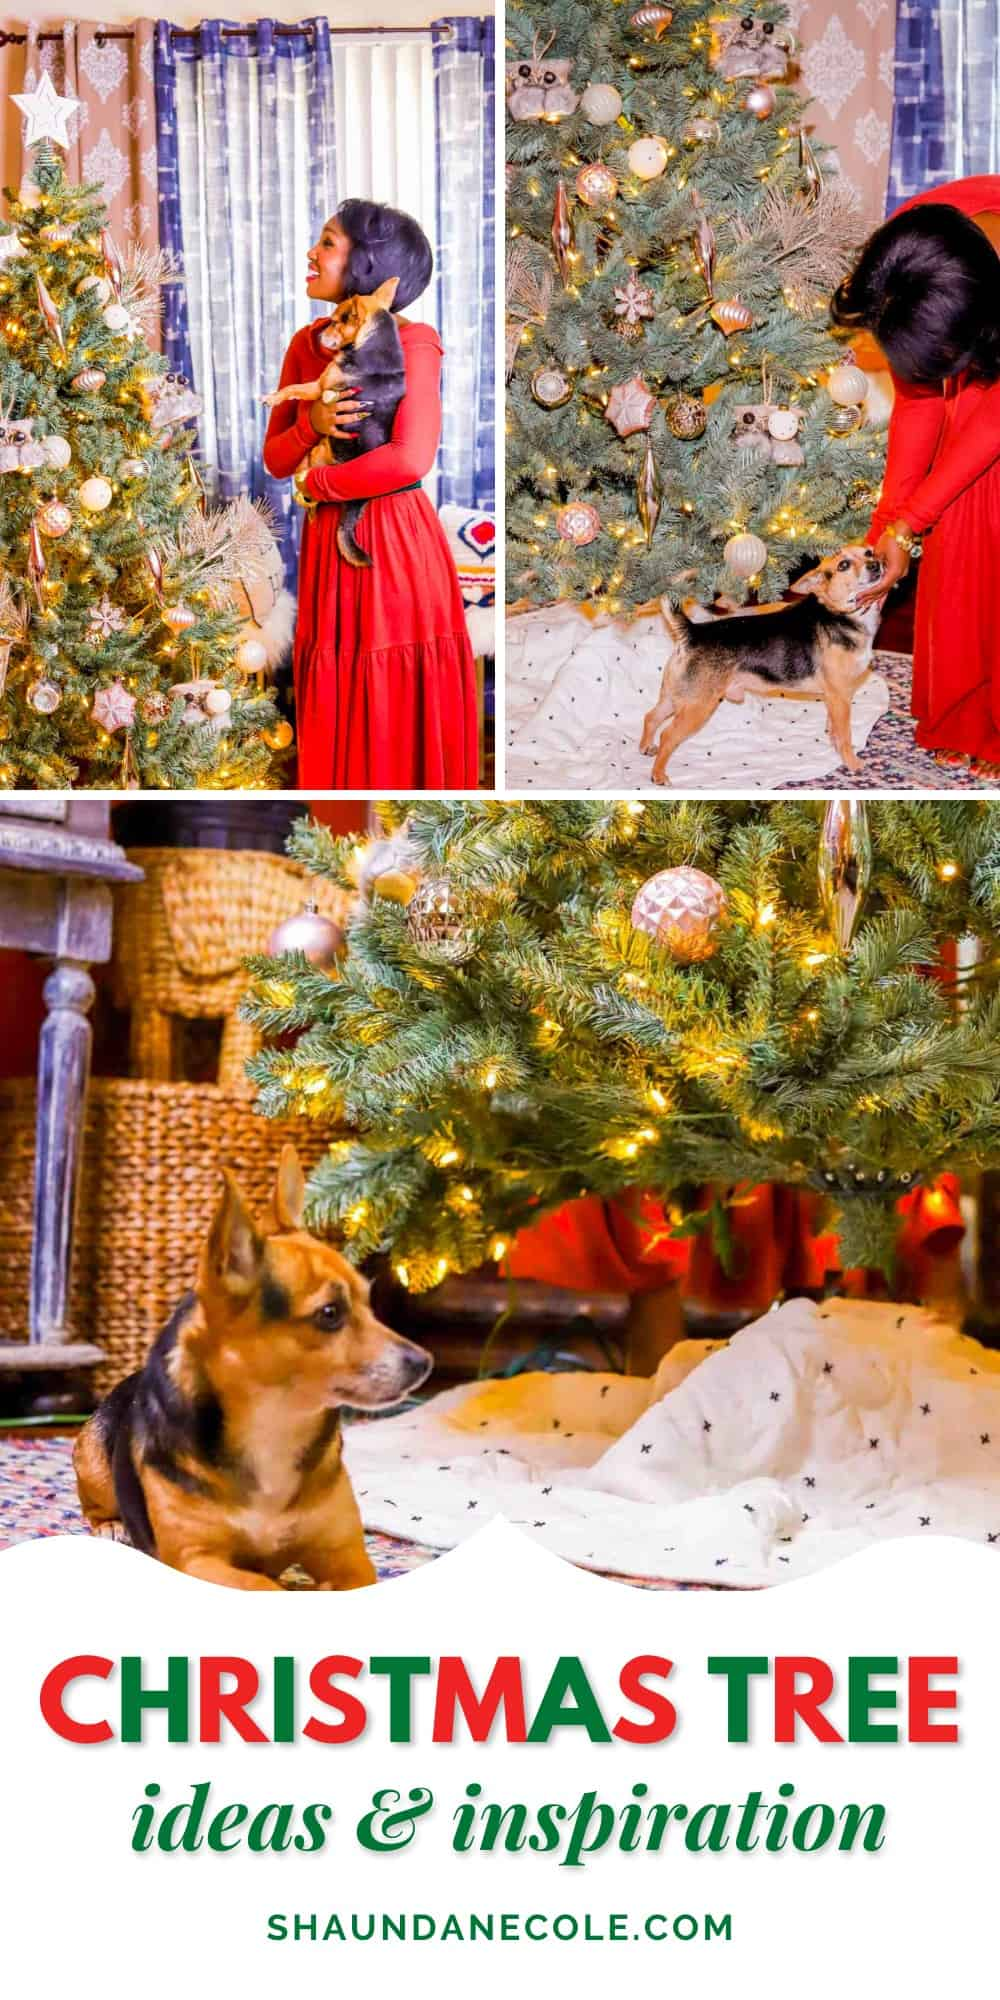 Best Christmas Trees Decorations Ideas & Inspiration